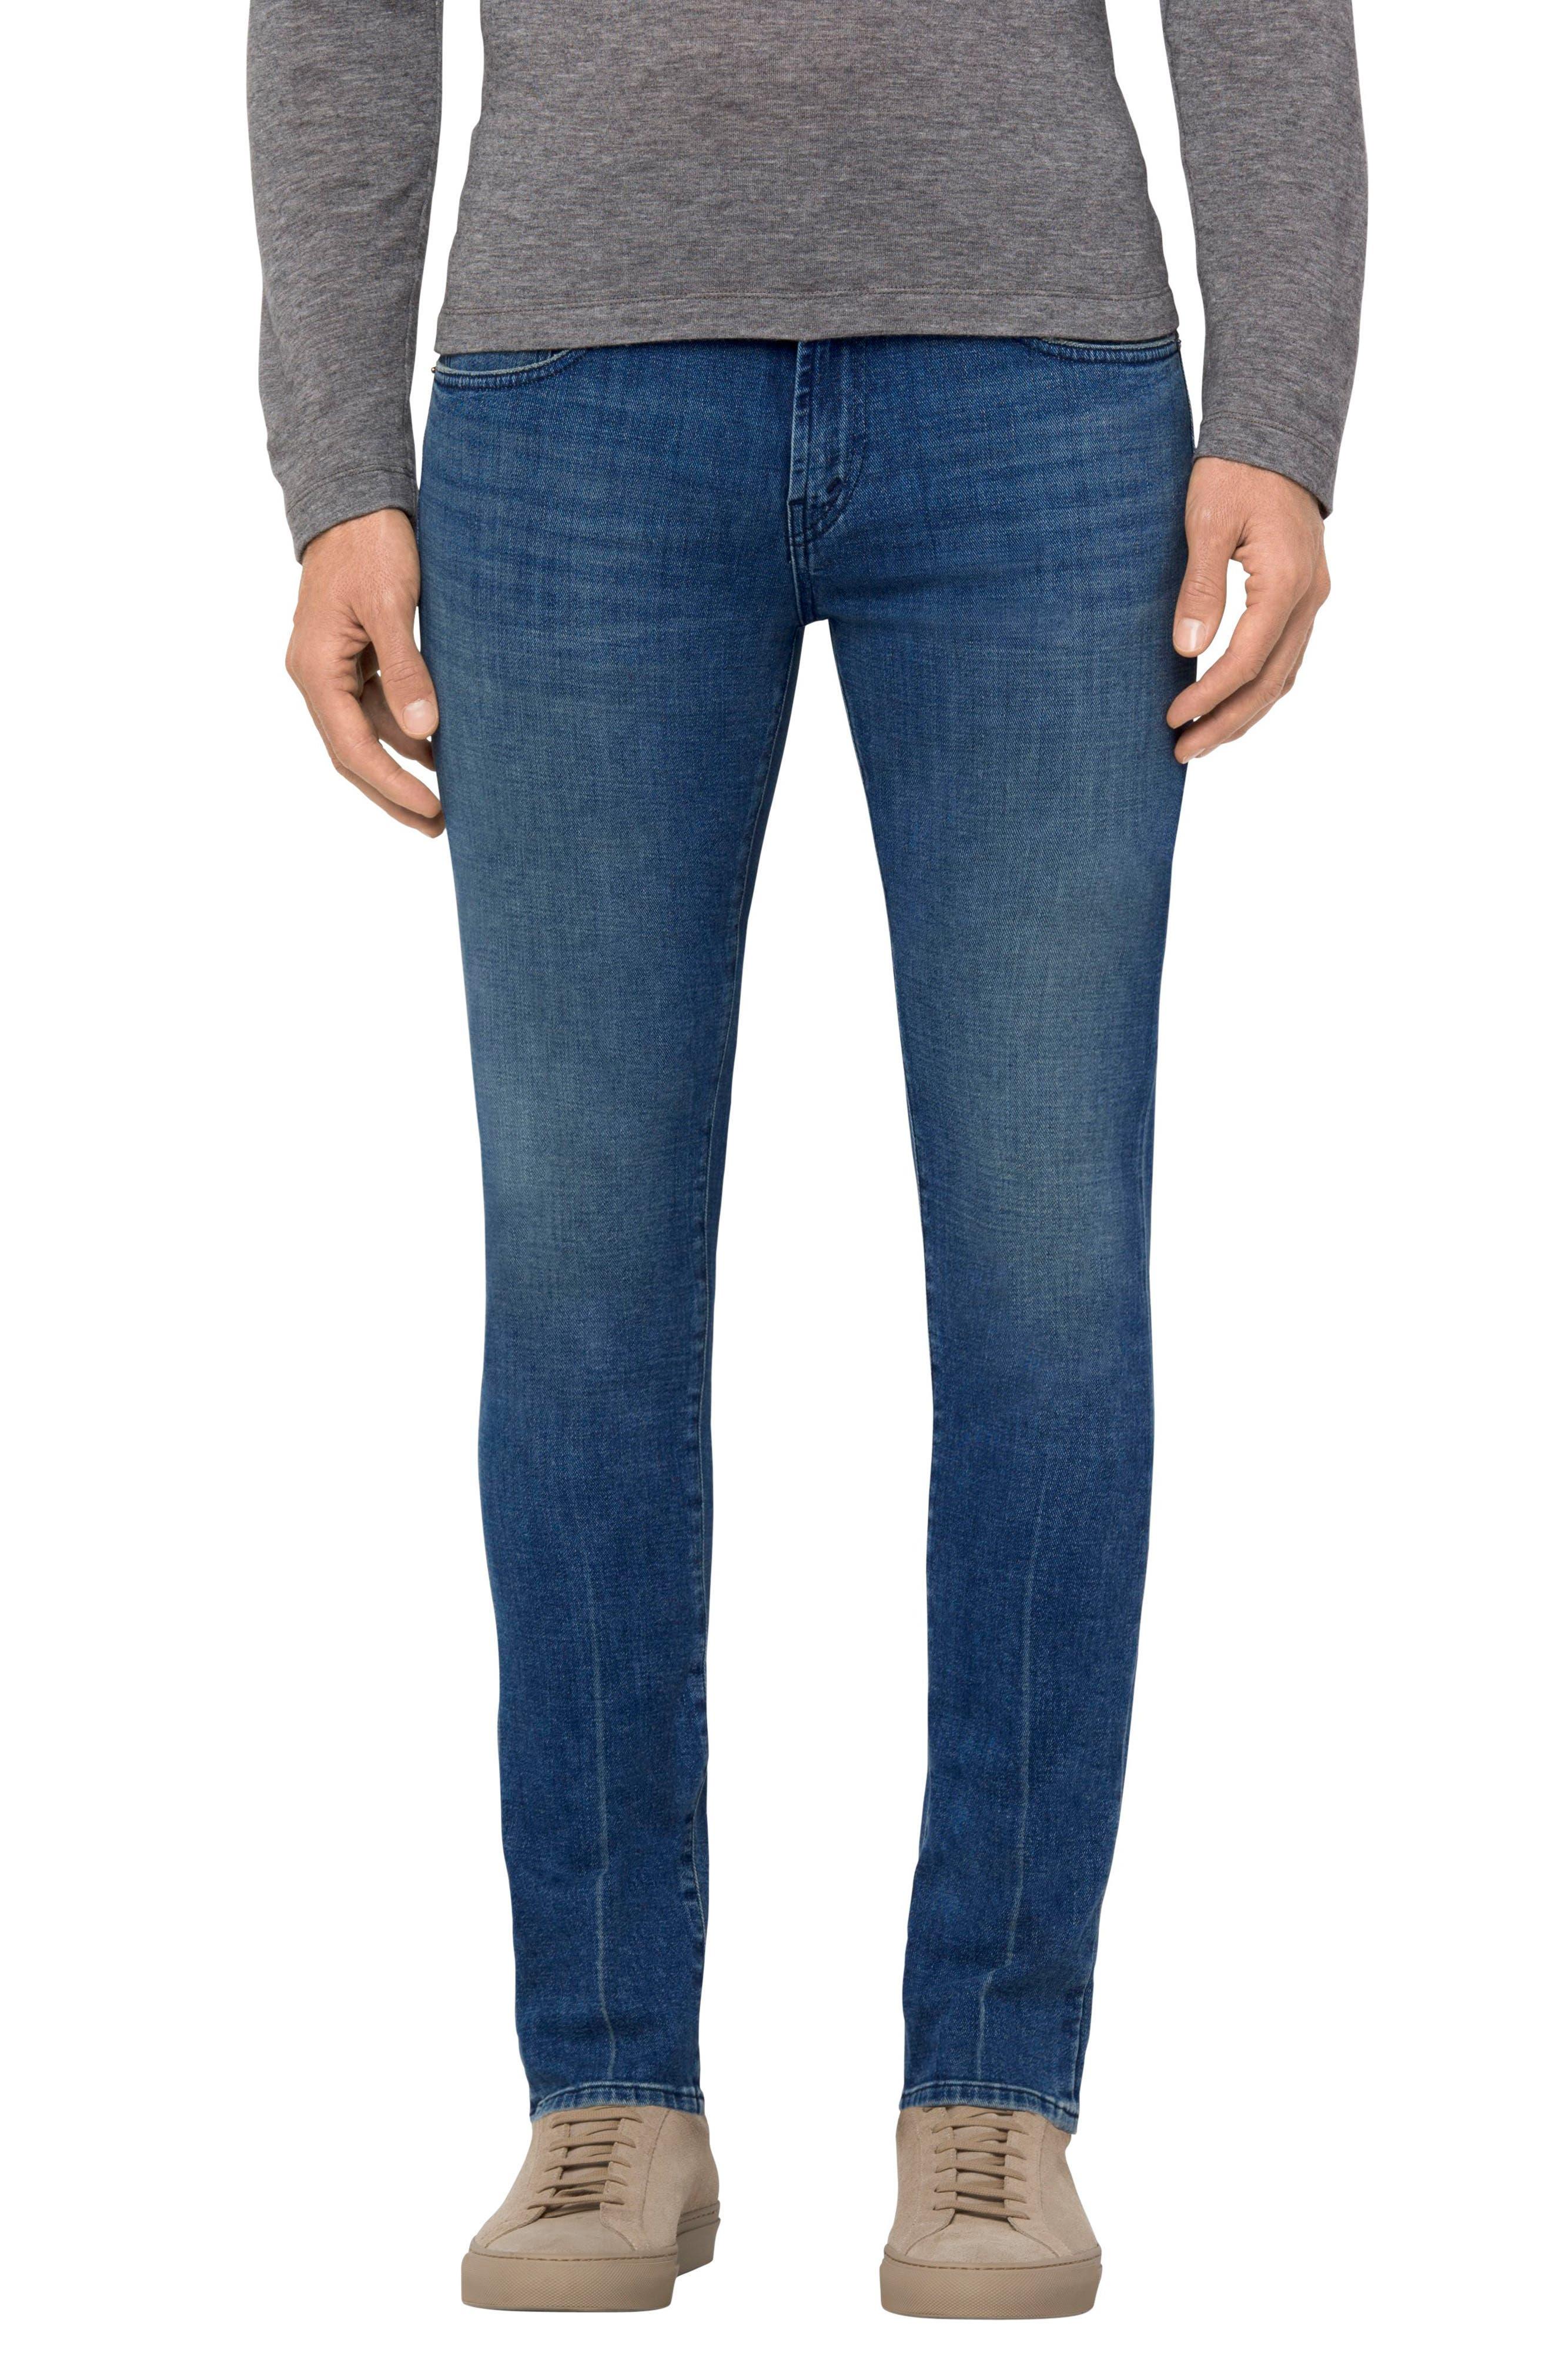 Main Image - J Brand Tyler Slim Fit Jeans (Mantaray)